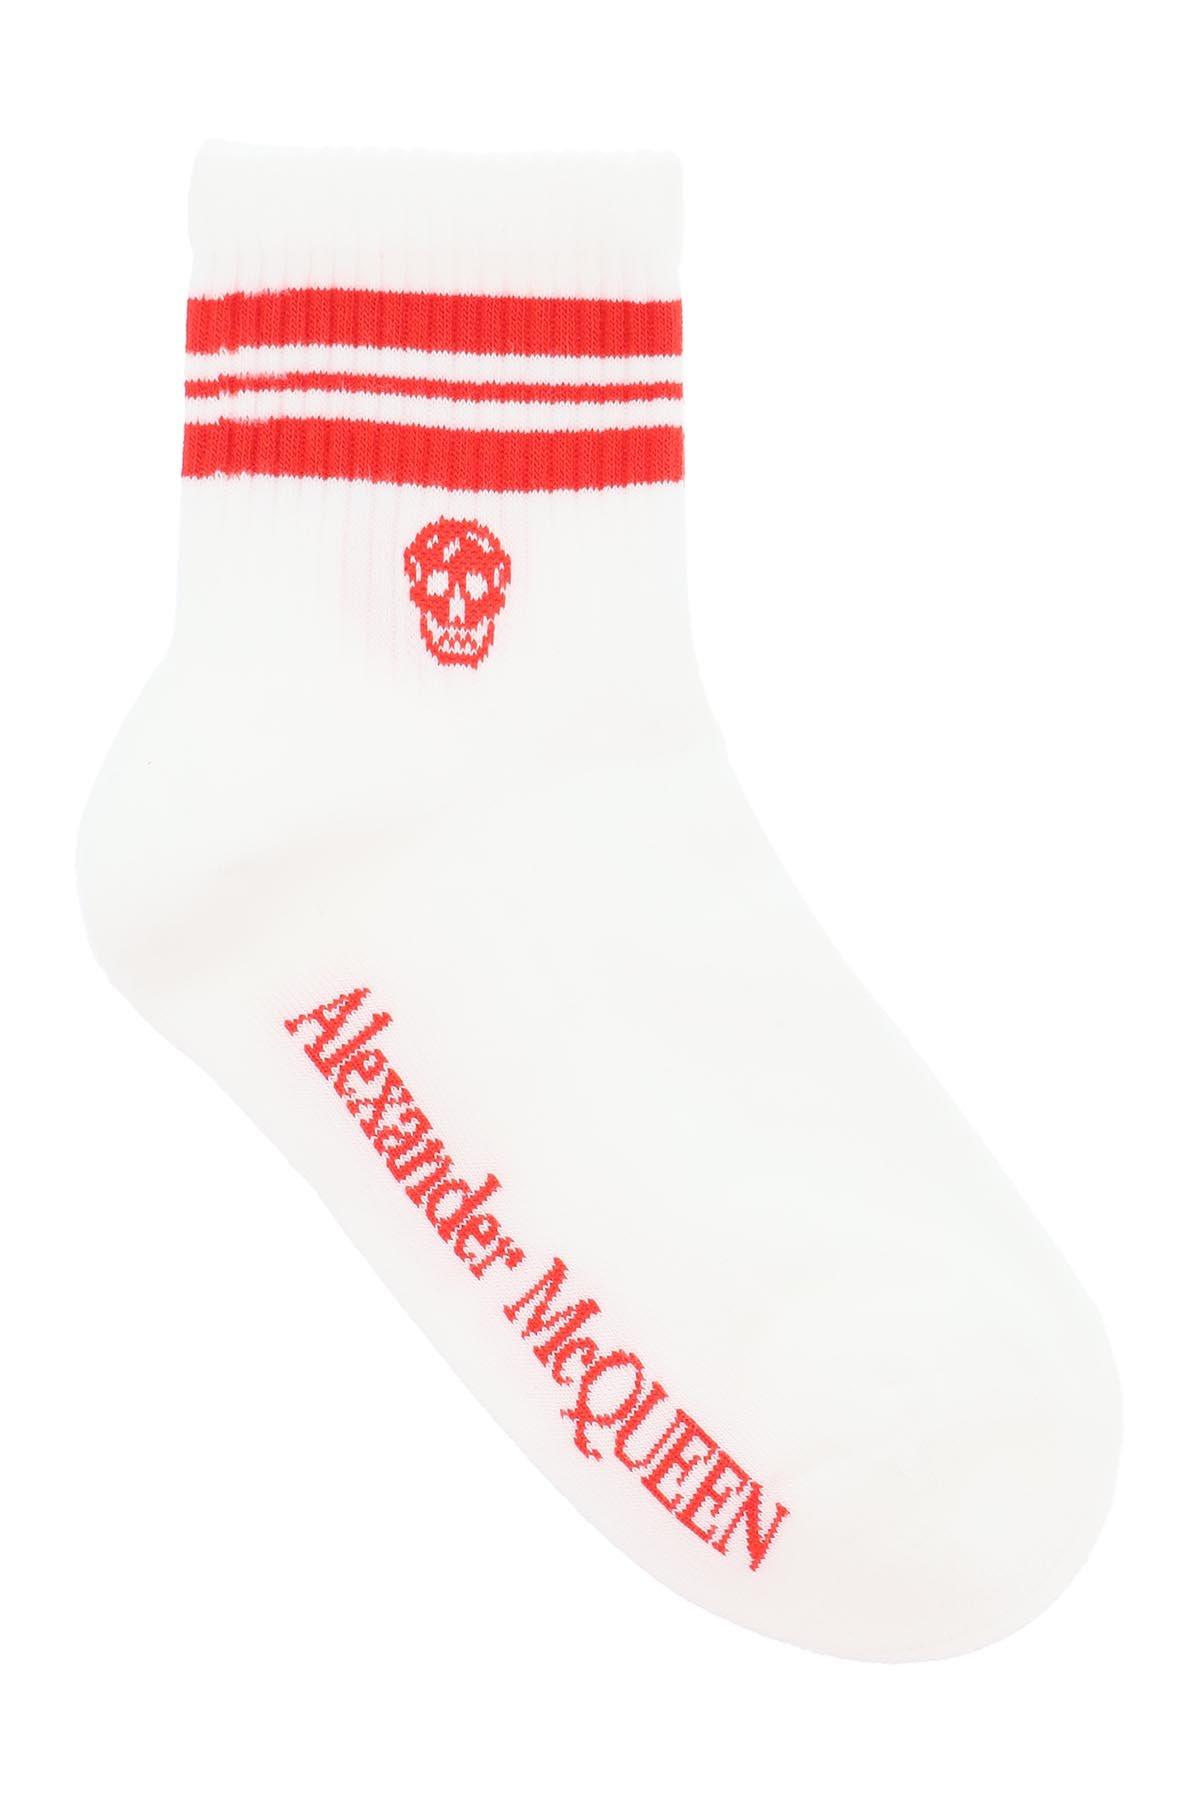 Alexander mcqueen calzini stripe skull sport